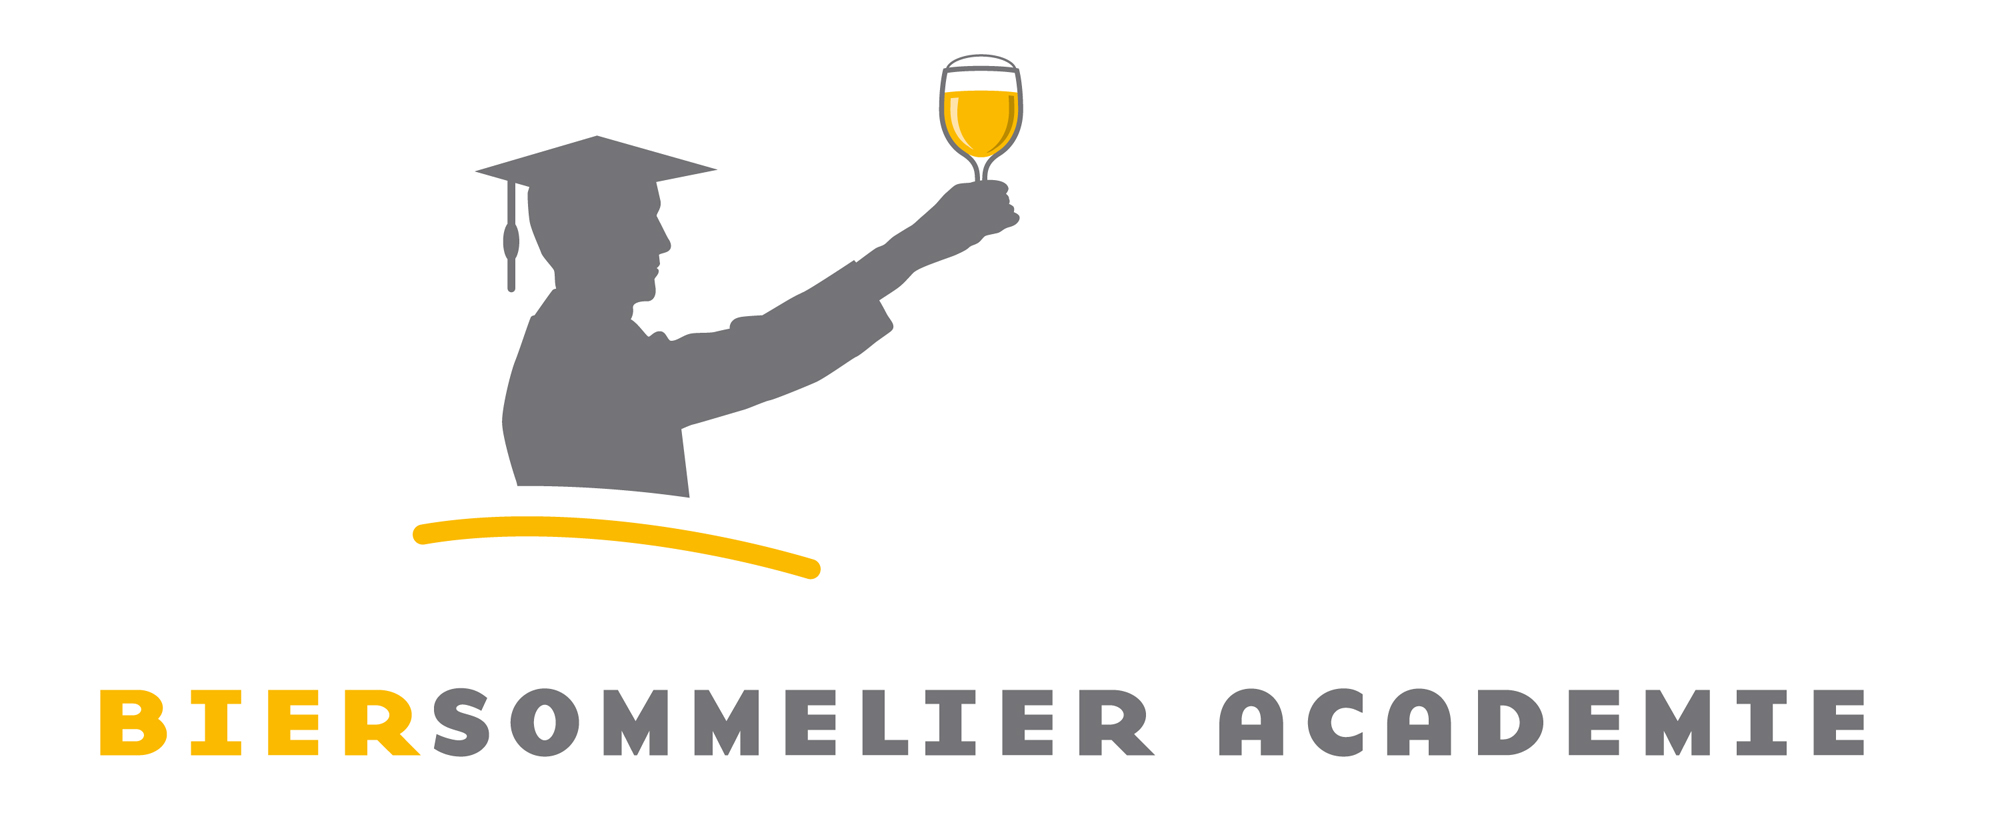 Bier Academie